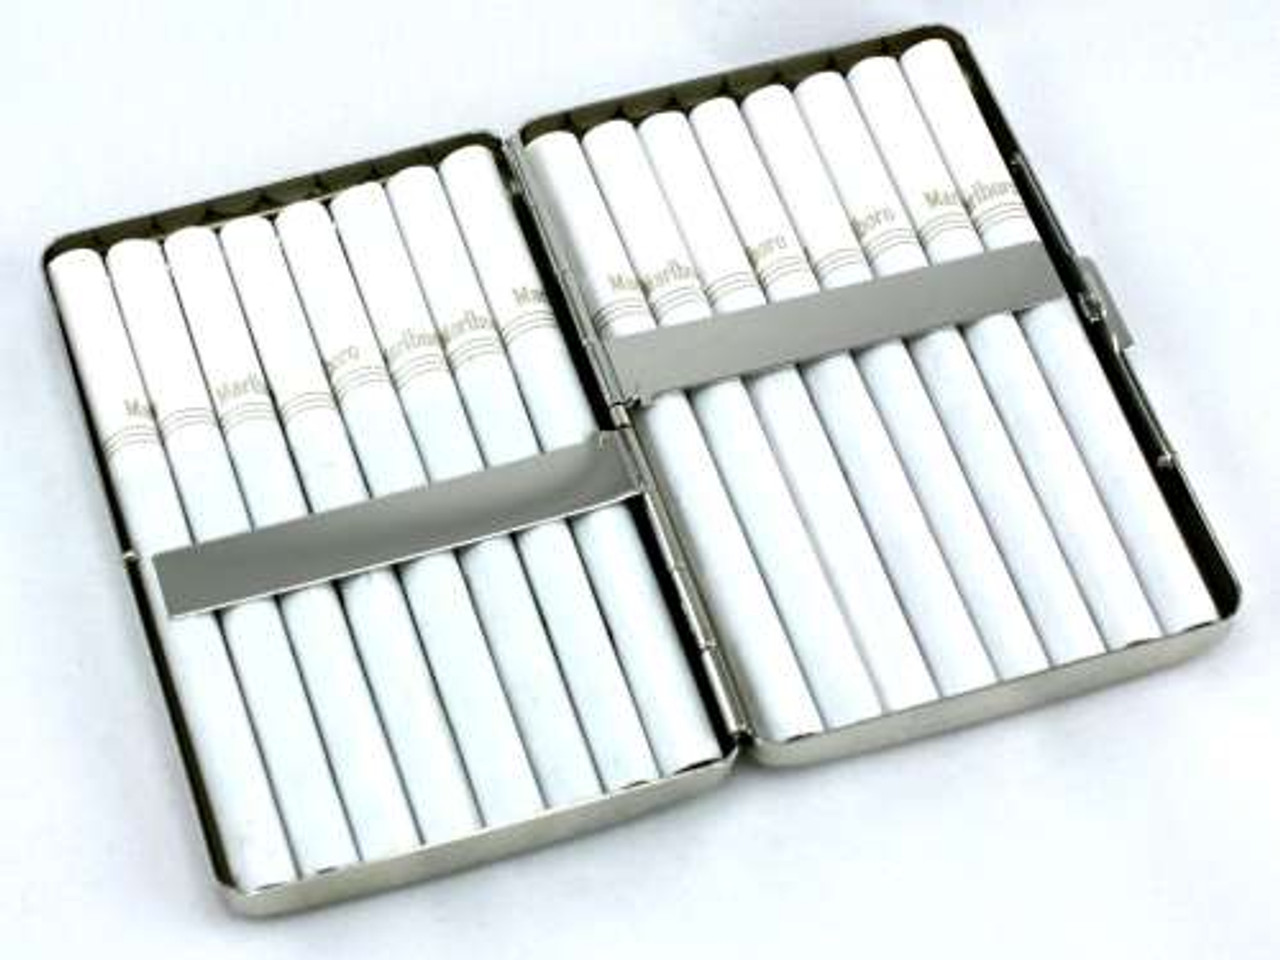 Silver Sparkling Cheetah Cigarette Case